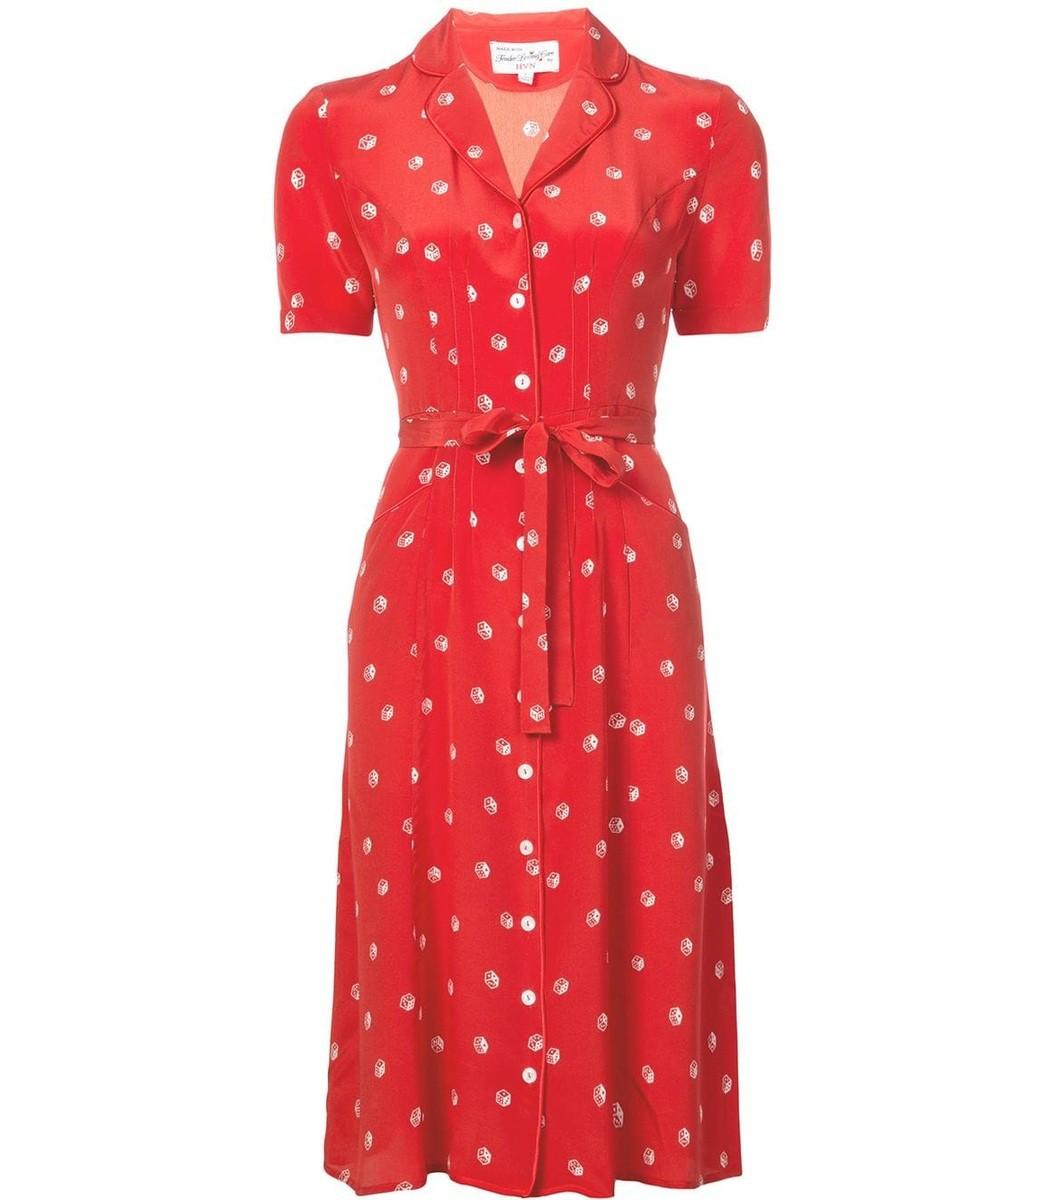 Harley Viera Newton Printed Tie Waist Shirt Dress - Red